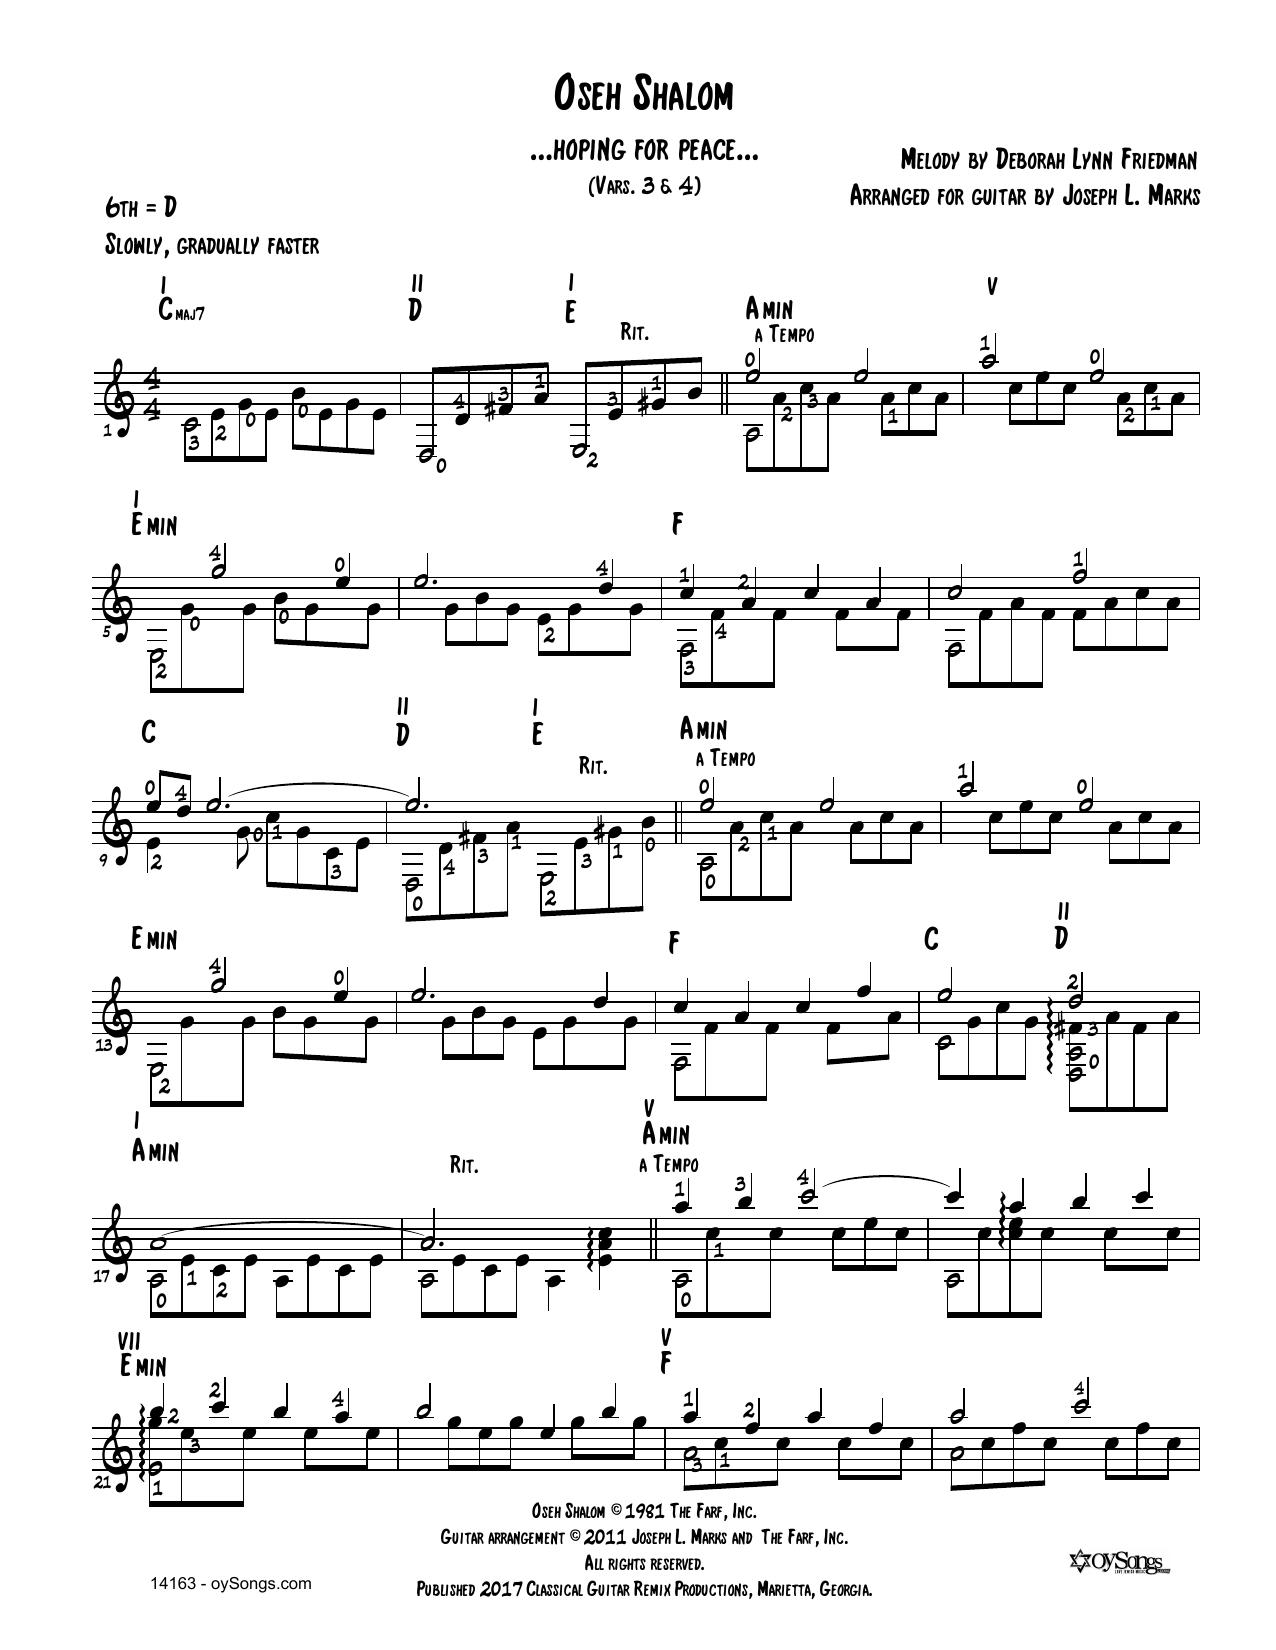 Debbie Friedman Oseh Shalom Vars 3, 4 (arr. Joe Marks) sheet music notes and chords. Download Printable PDF.